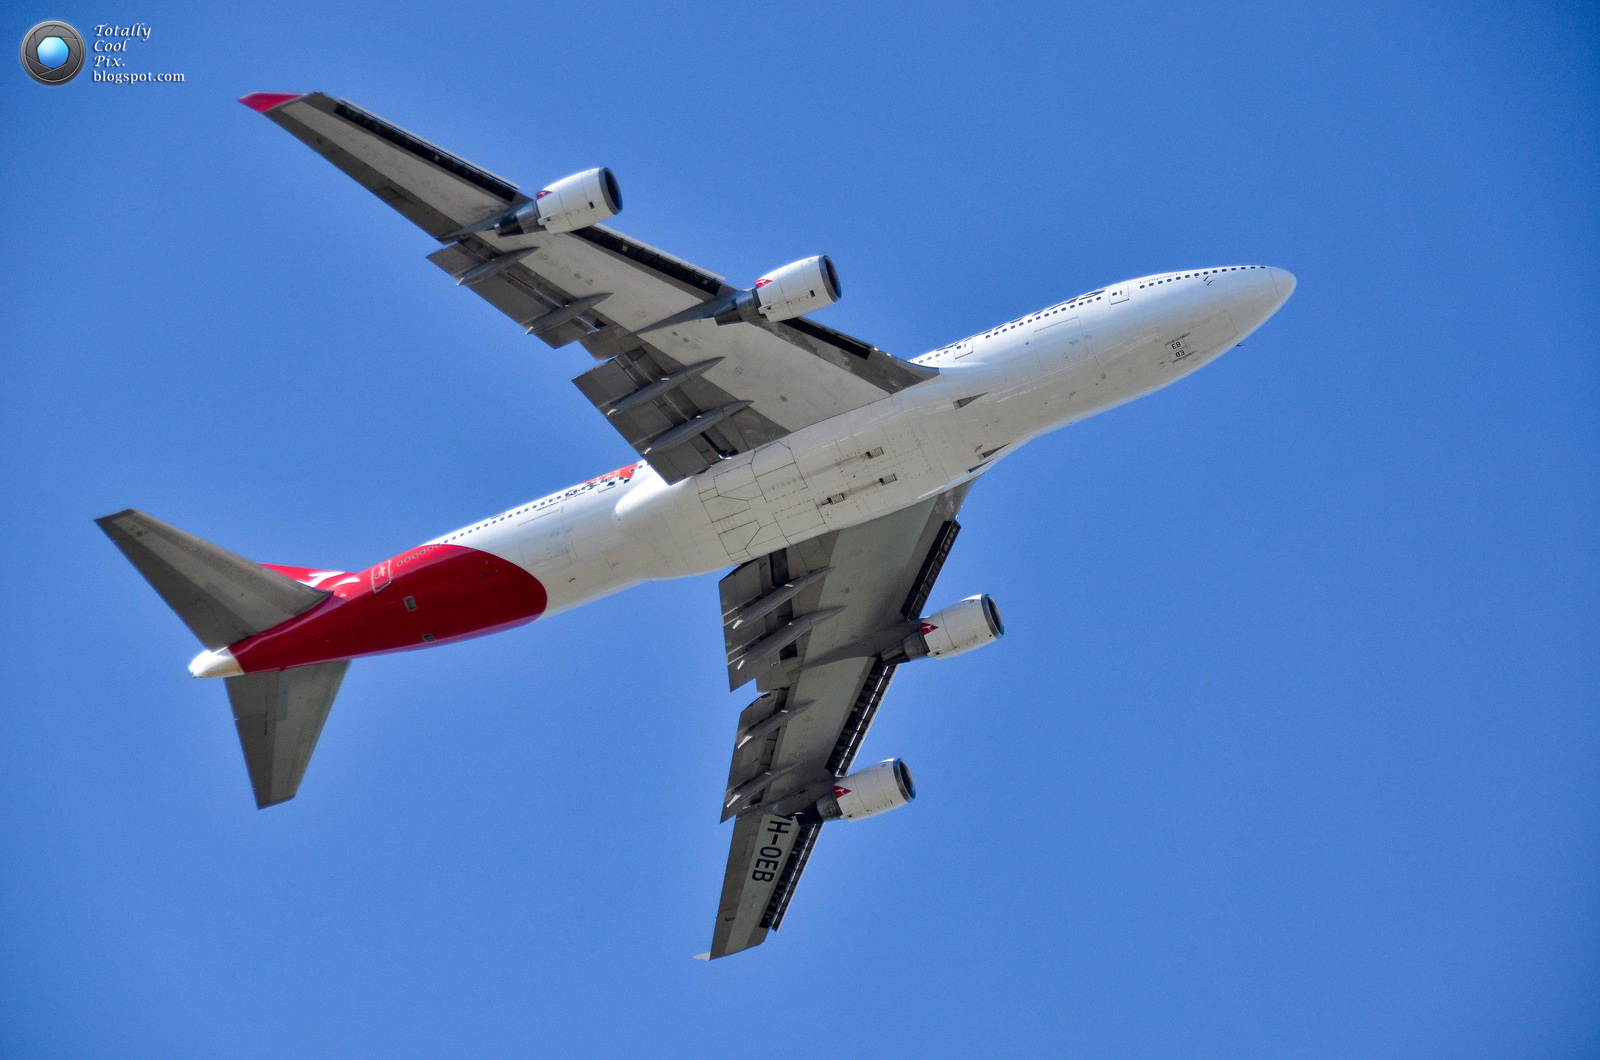 http://2.bp.blogspot.com/-roOtERDd5oQ/T9xV4wSP5FI/AAAAAAAABUo/epZtrcfZmTE/s1600/21-Australia-2012-F1-Grand-Prix-Airshow-Wallpaper-Keith-McInnes-Photography-QANTAS-747.jpg